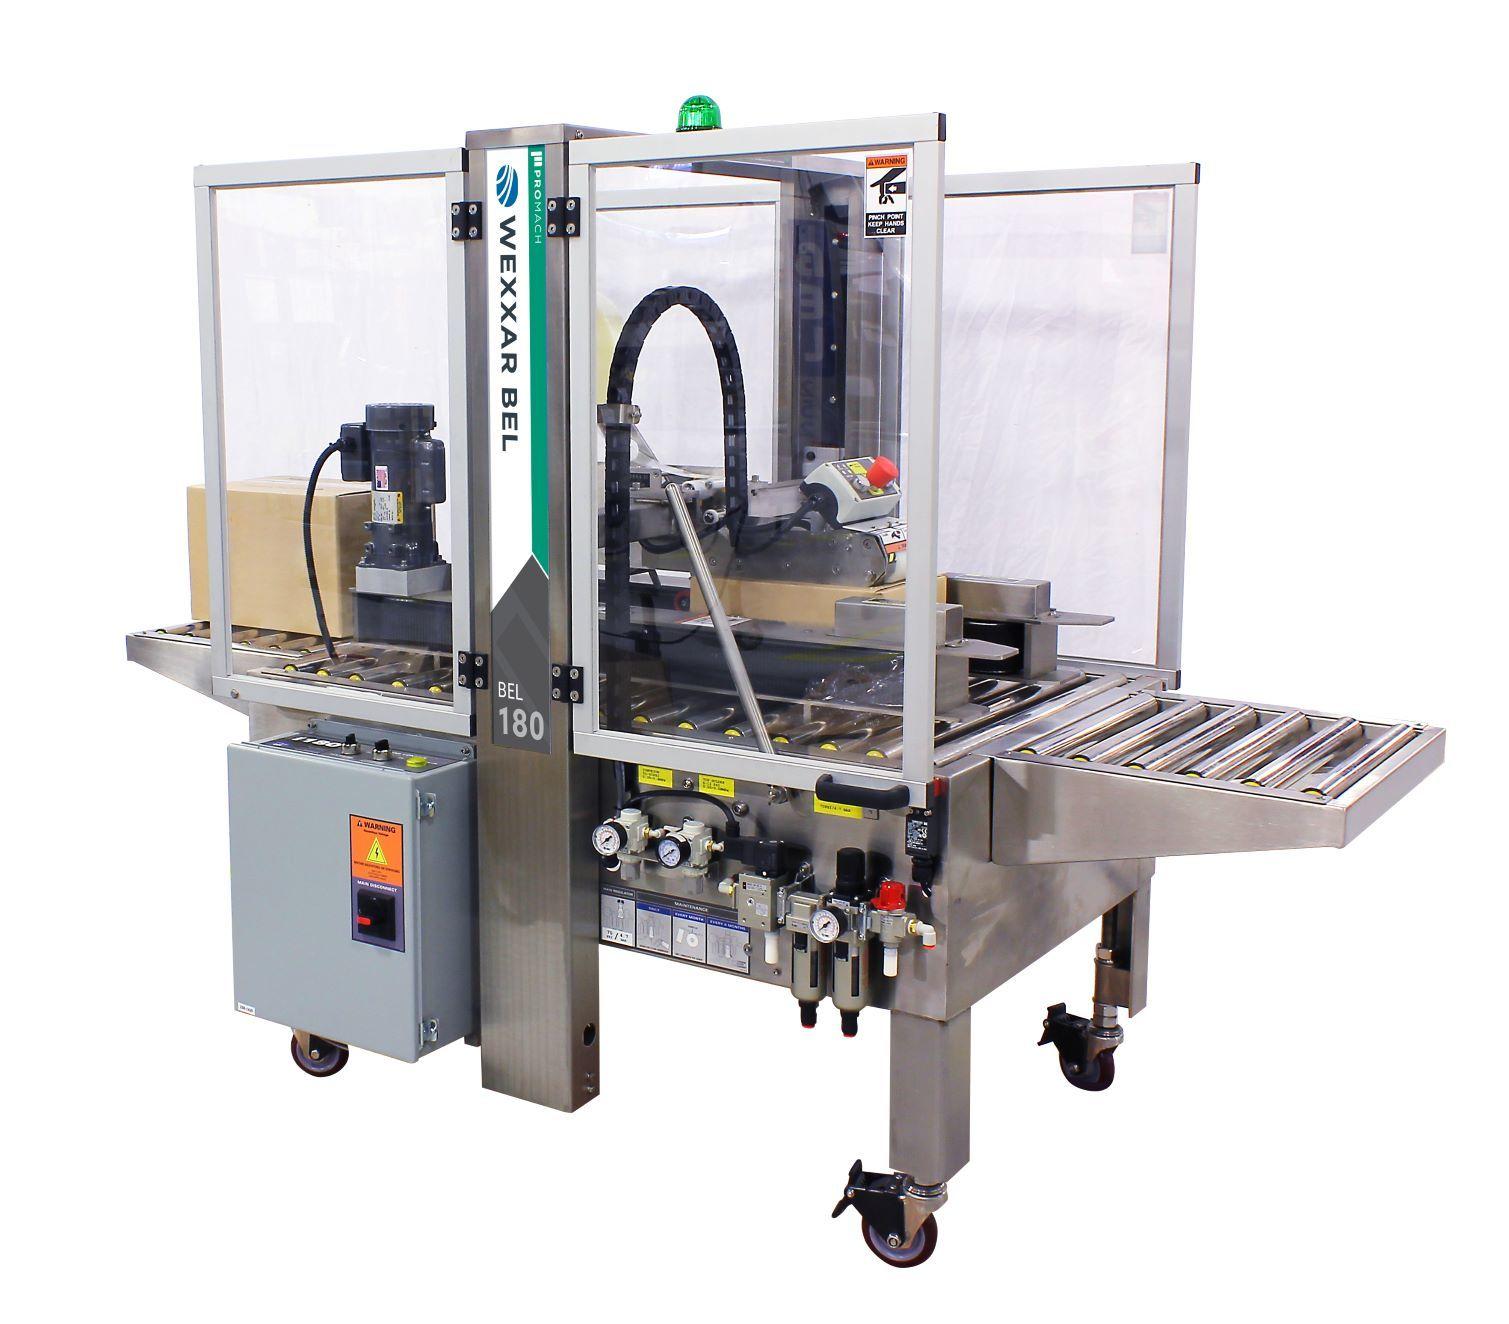 BEL 180 - Semi-Automatic Random Case Taper - Pressure Sensitive Tape Case Sealing Equipment